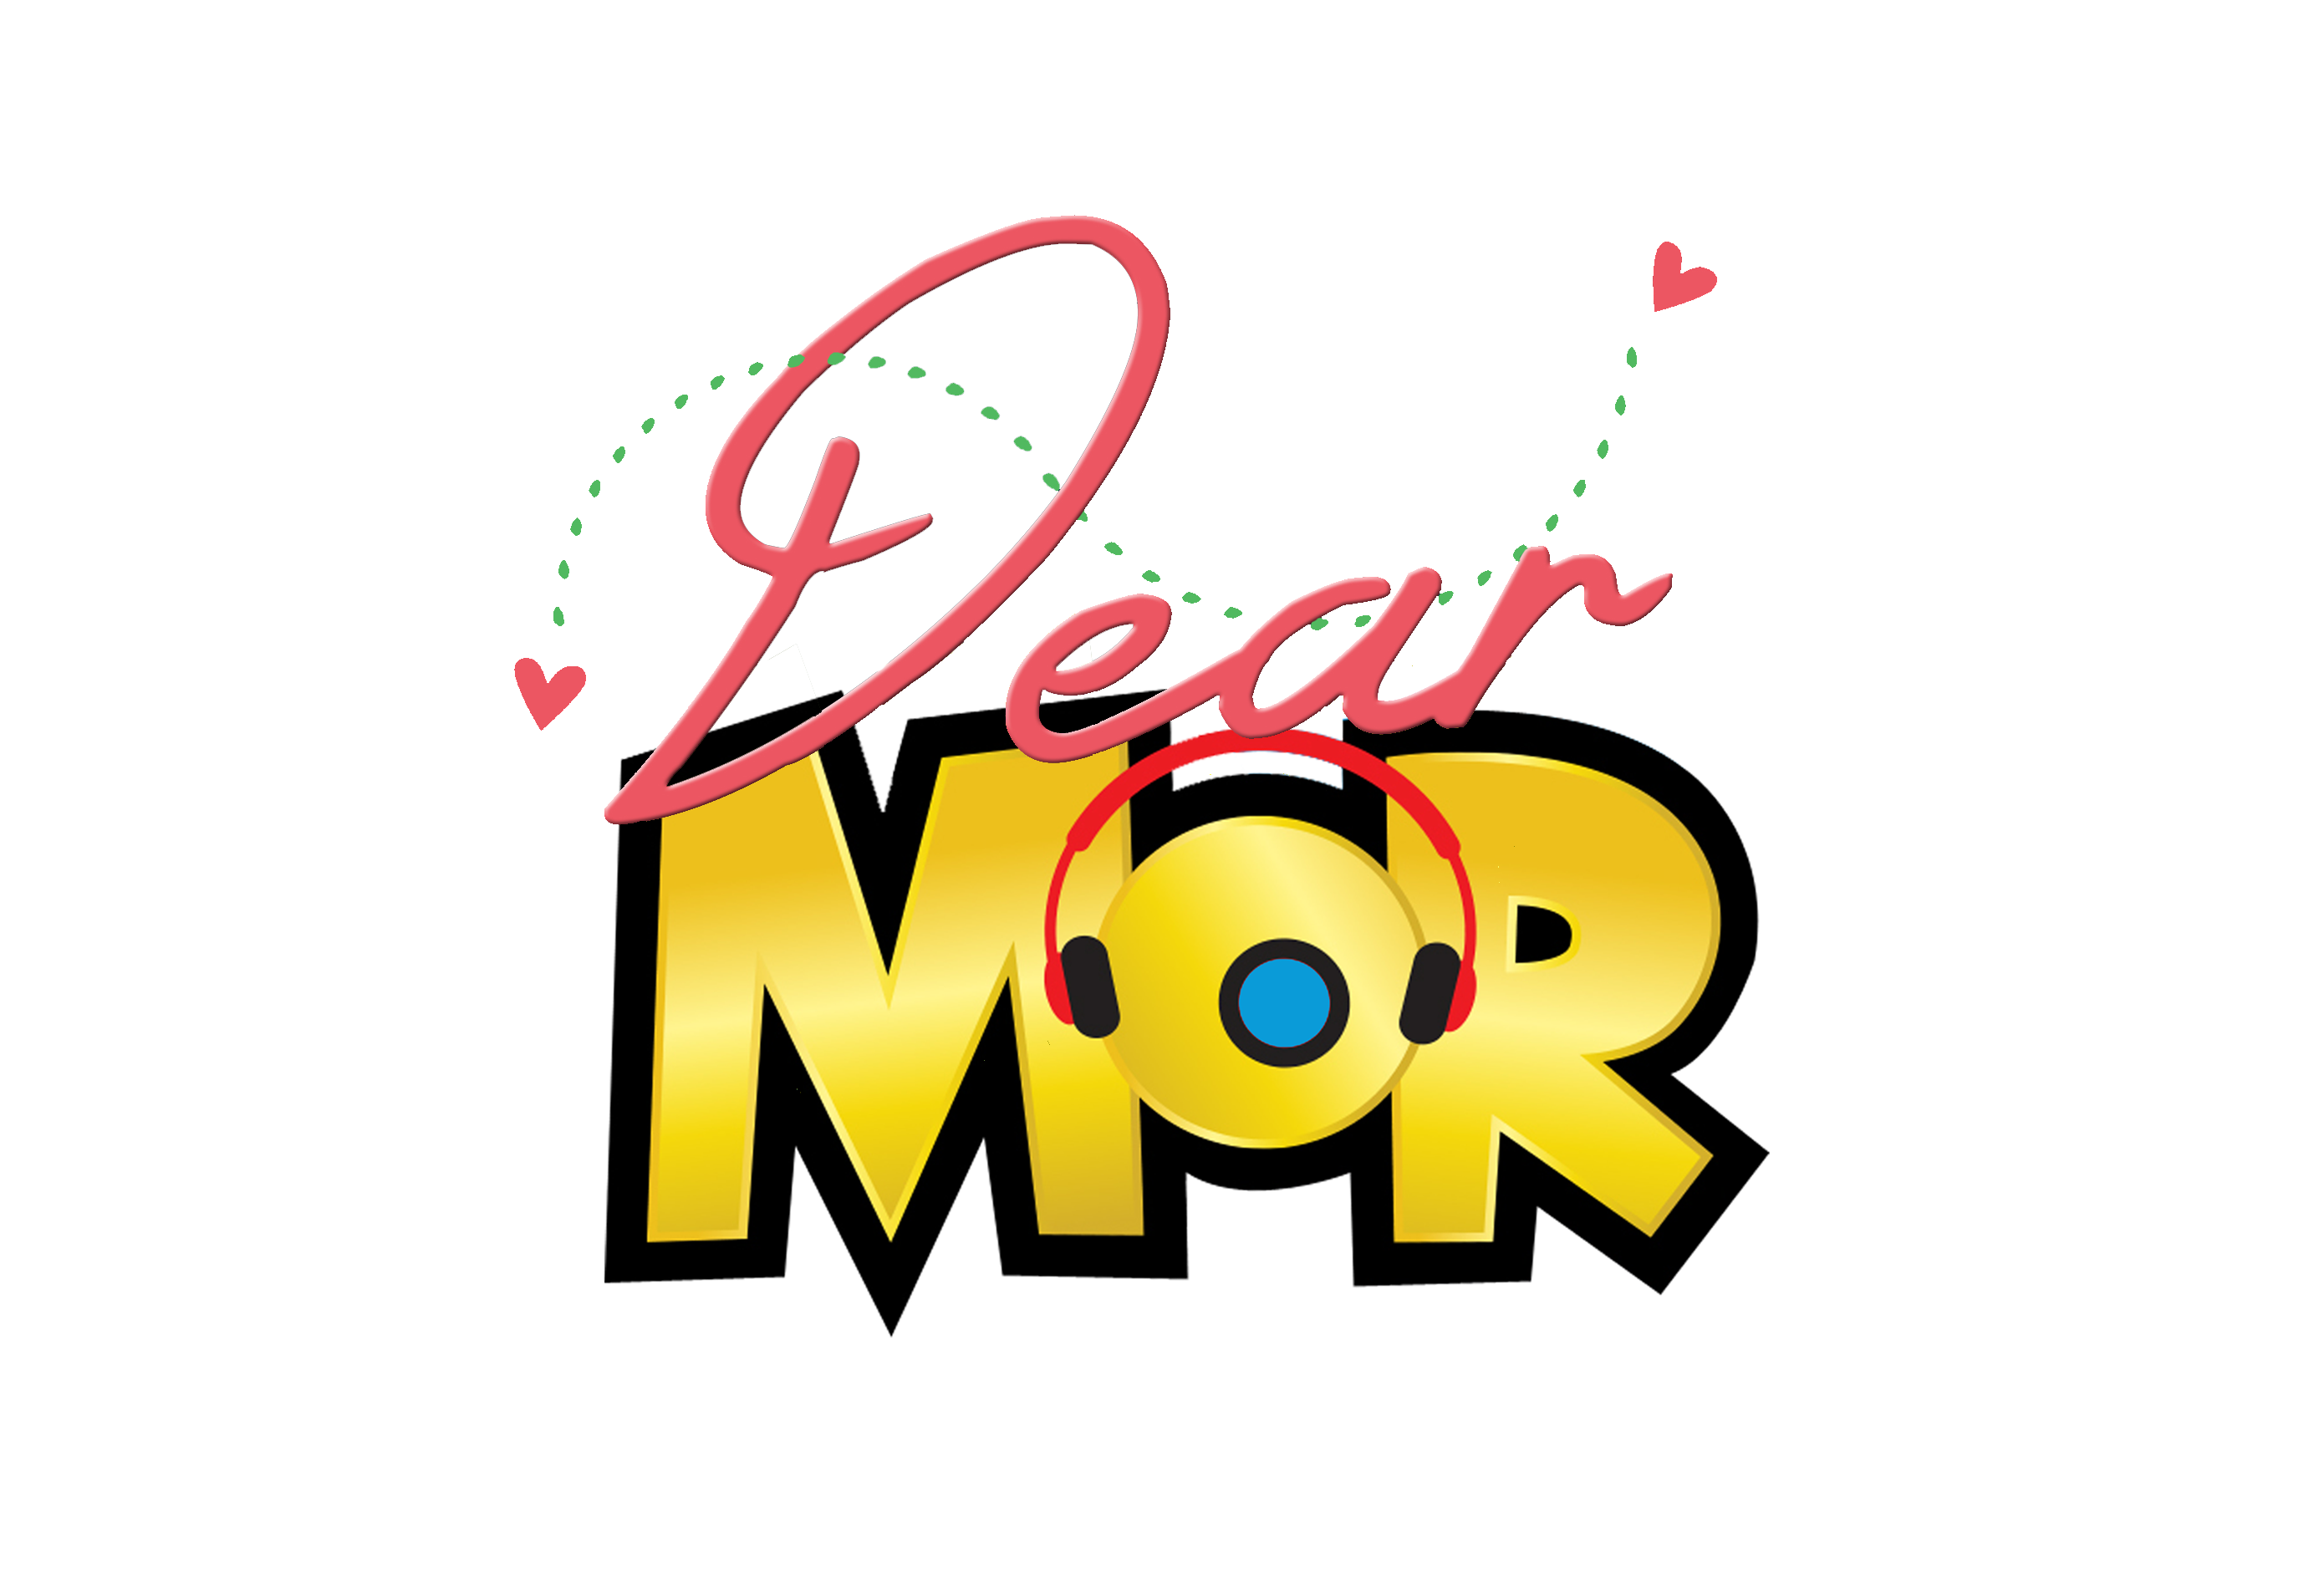 Dear MOR